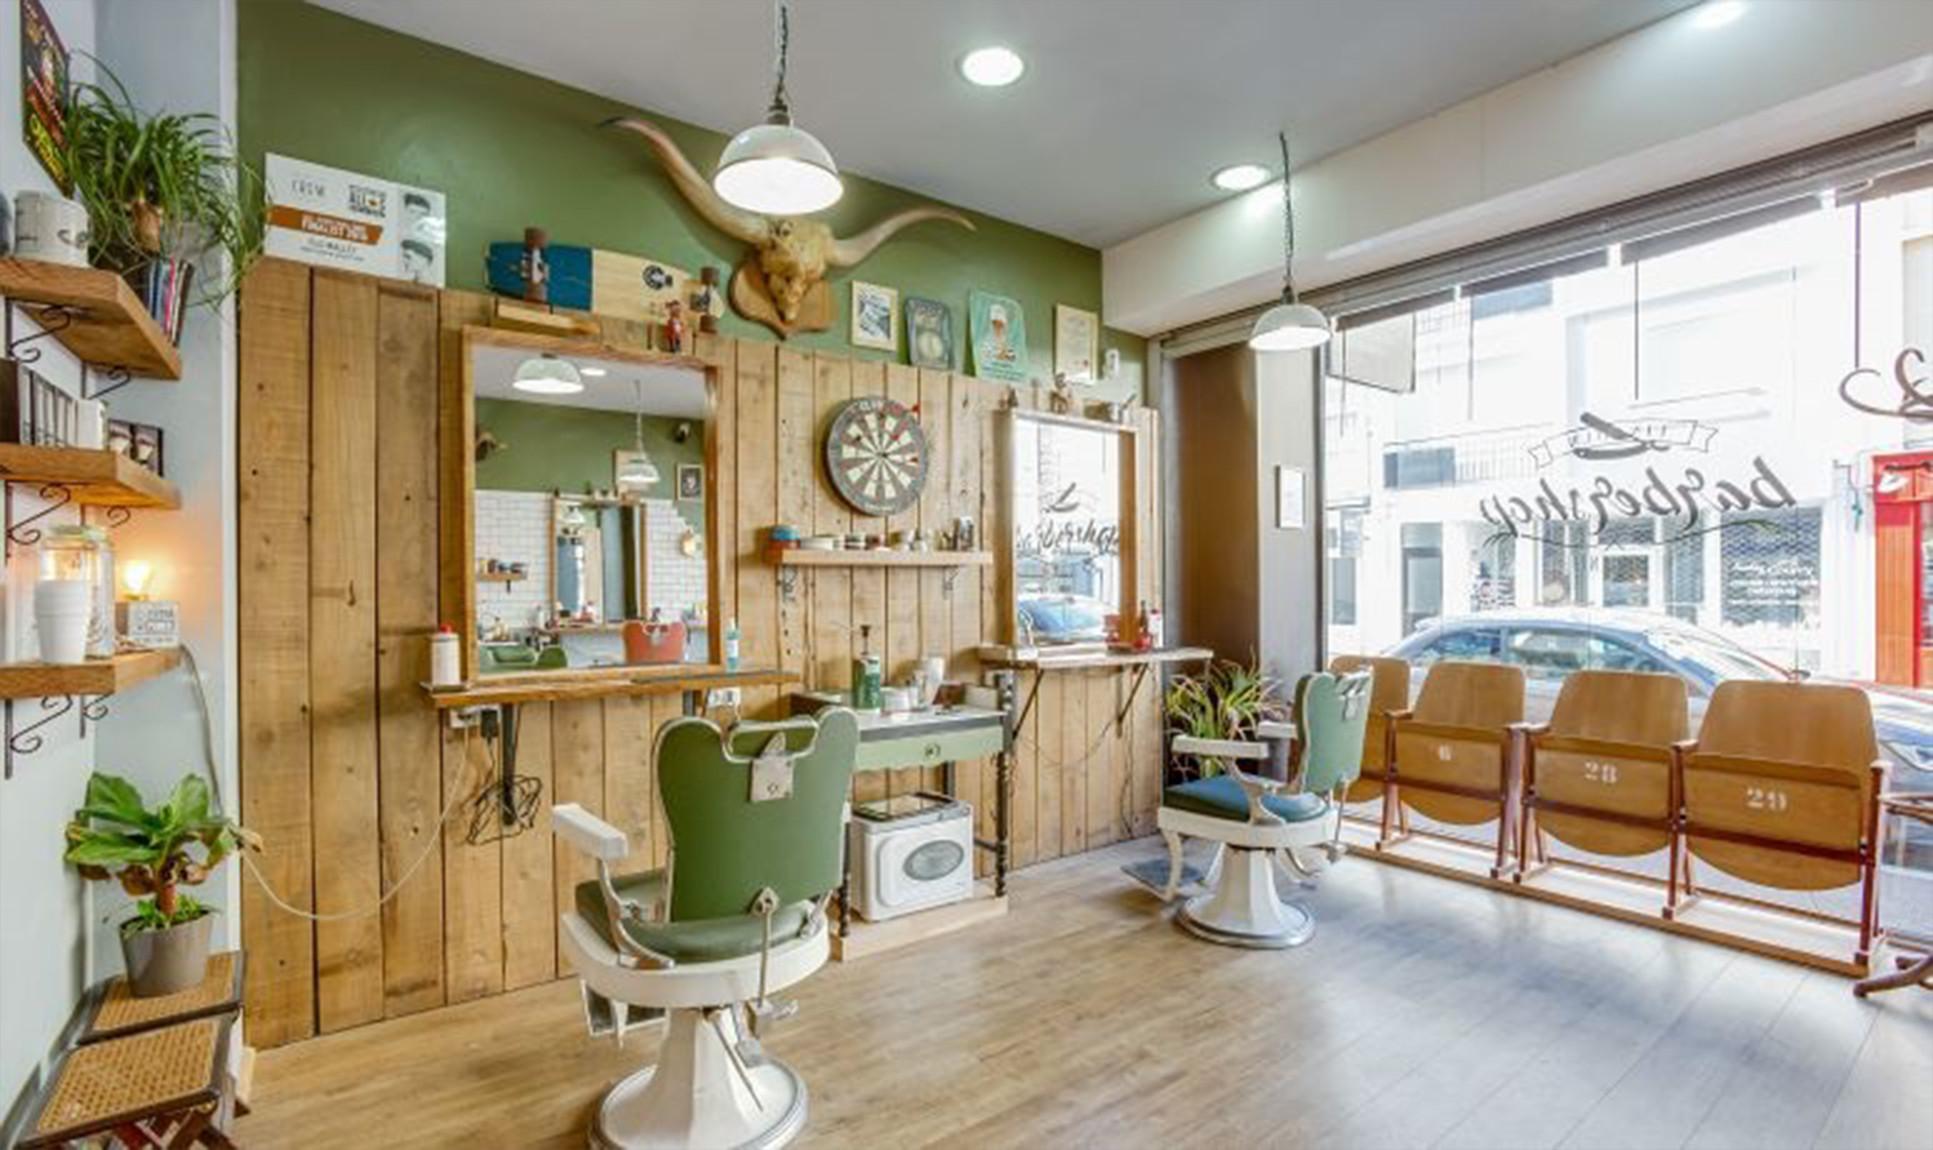 Lincoln Barbershop